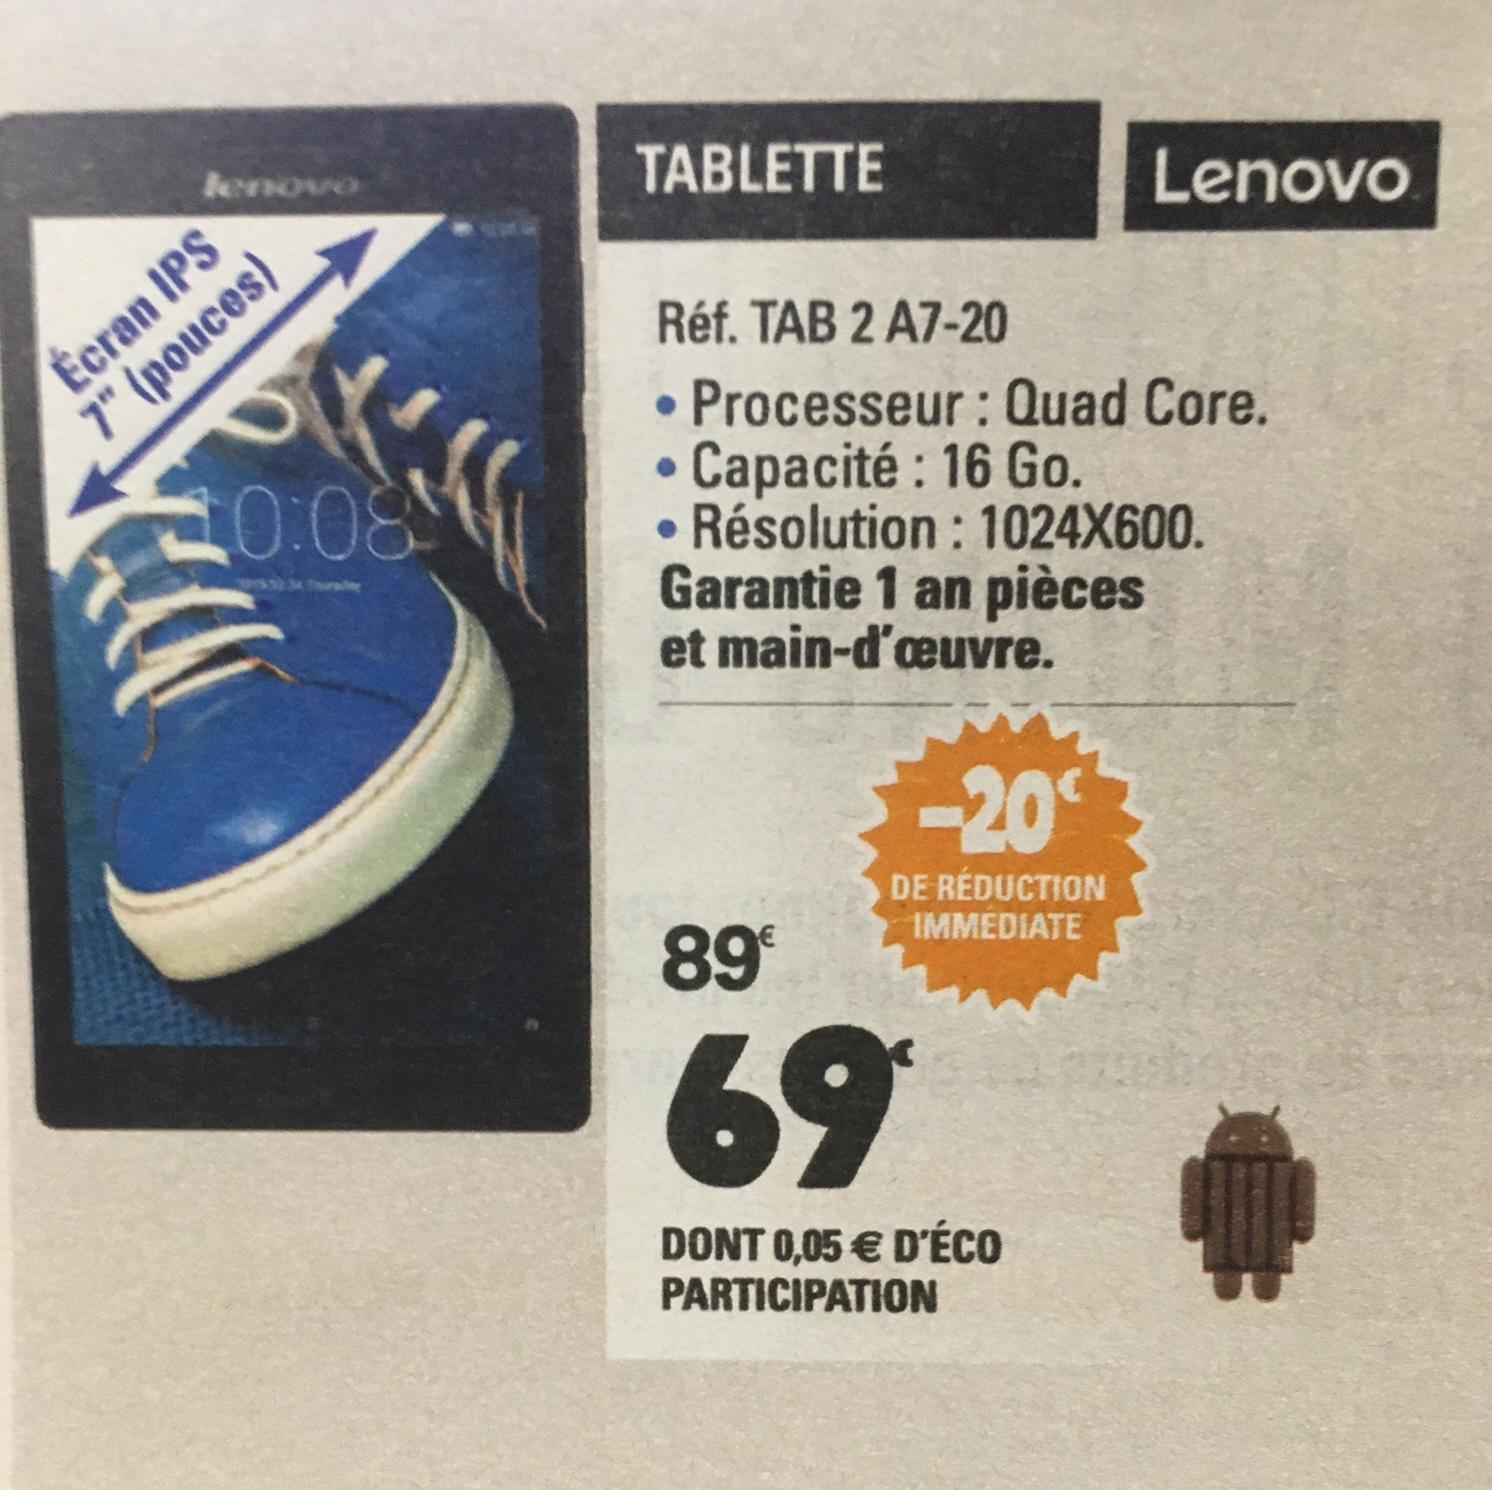 "Tablette 7"" Lenovo Tab 2 A7-20 (via ODR de 20€)  ou en magasin"